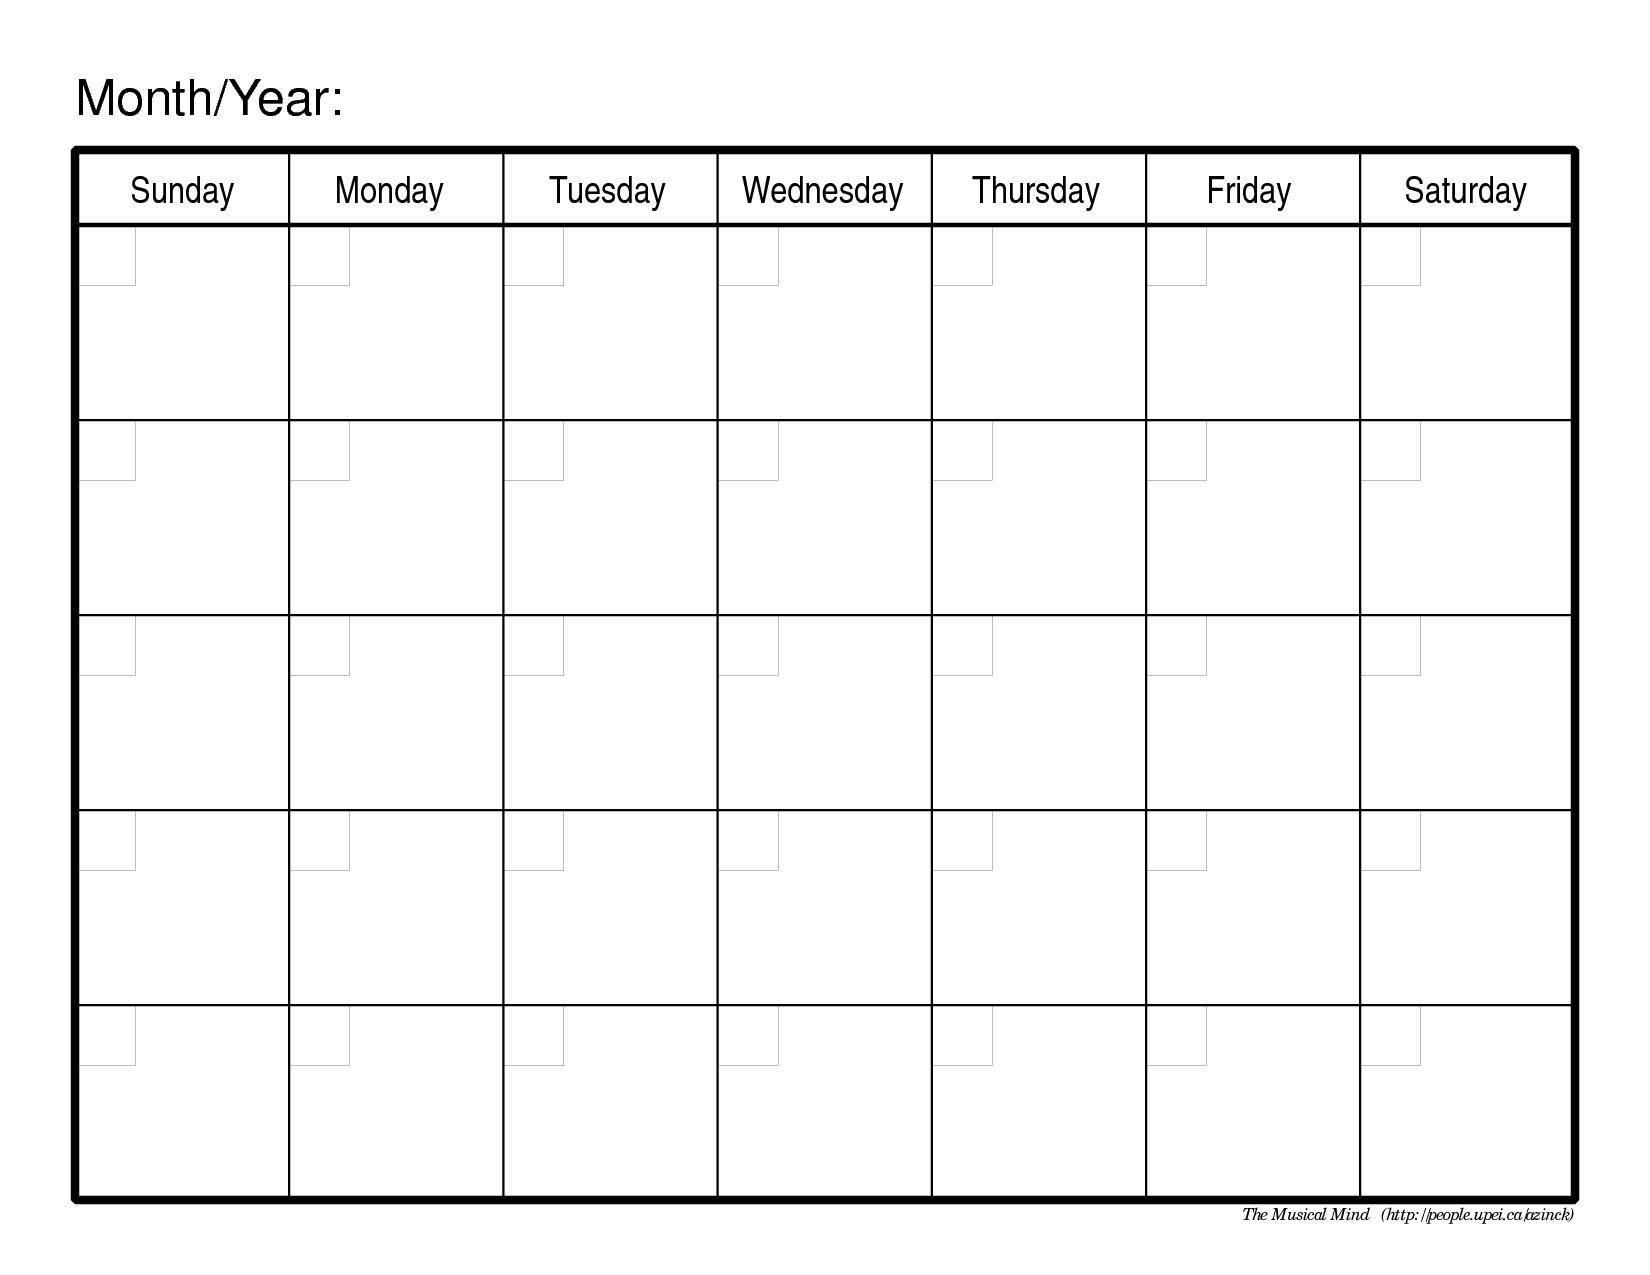 001 Blank Calendar Template Pdf Ideas Monthly Printable Mdxar for Weekly Blank Calendar Printable Pdf